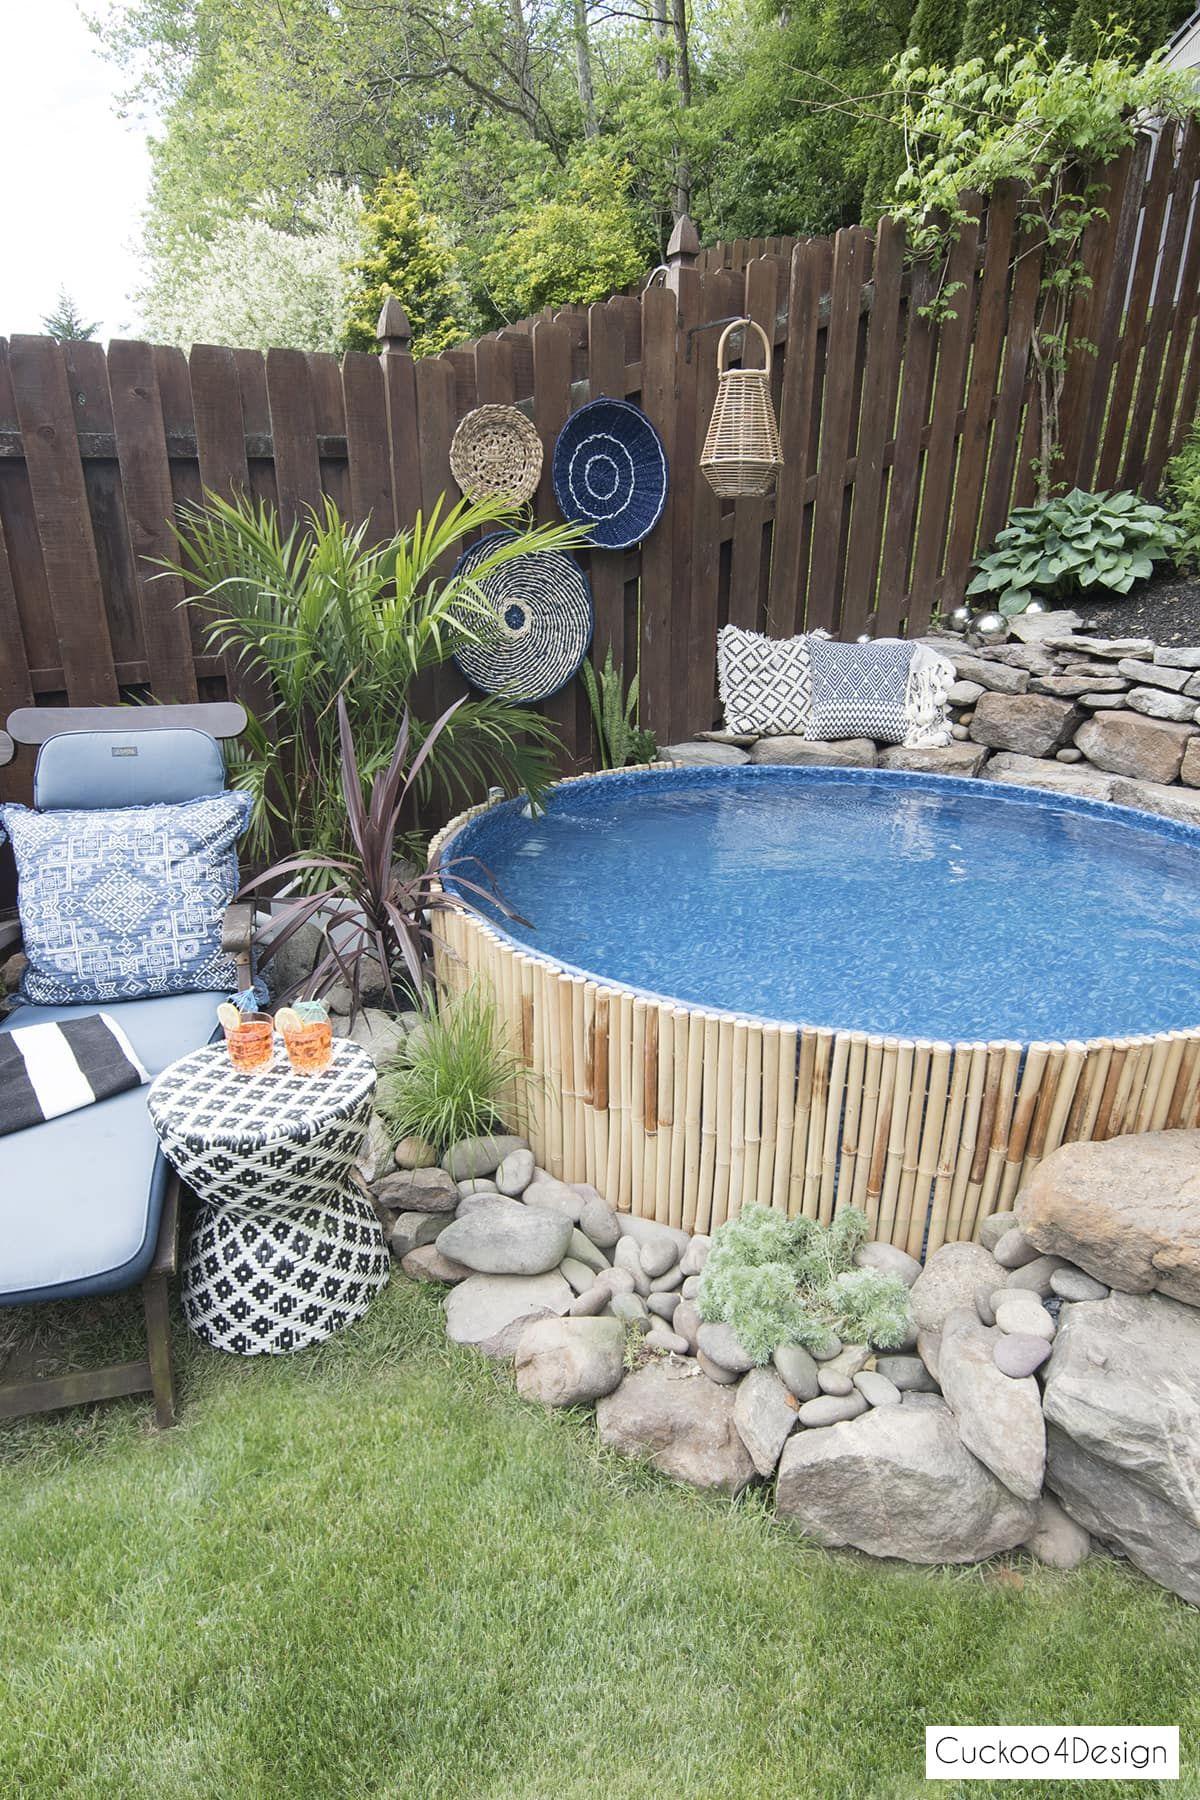 pool tank pools yard swimming sloped backyard patio hillbilly intex landscaping building decorations cuckoo4design galvanized bench liner trash creative piscina